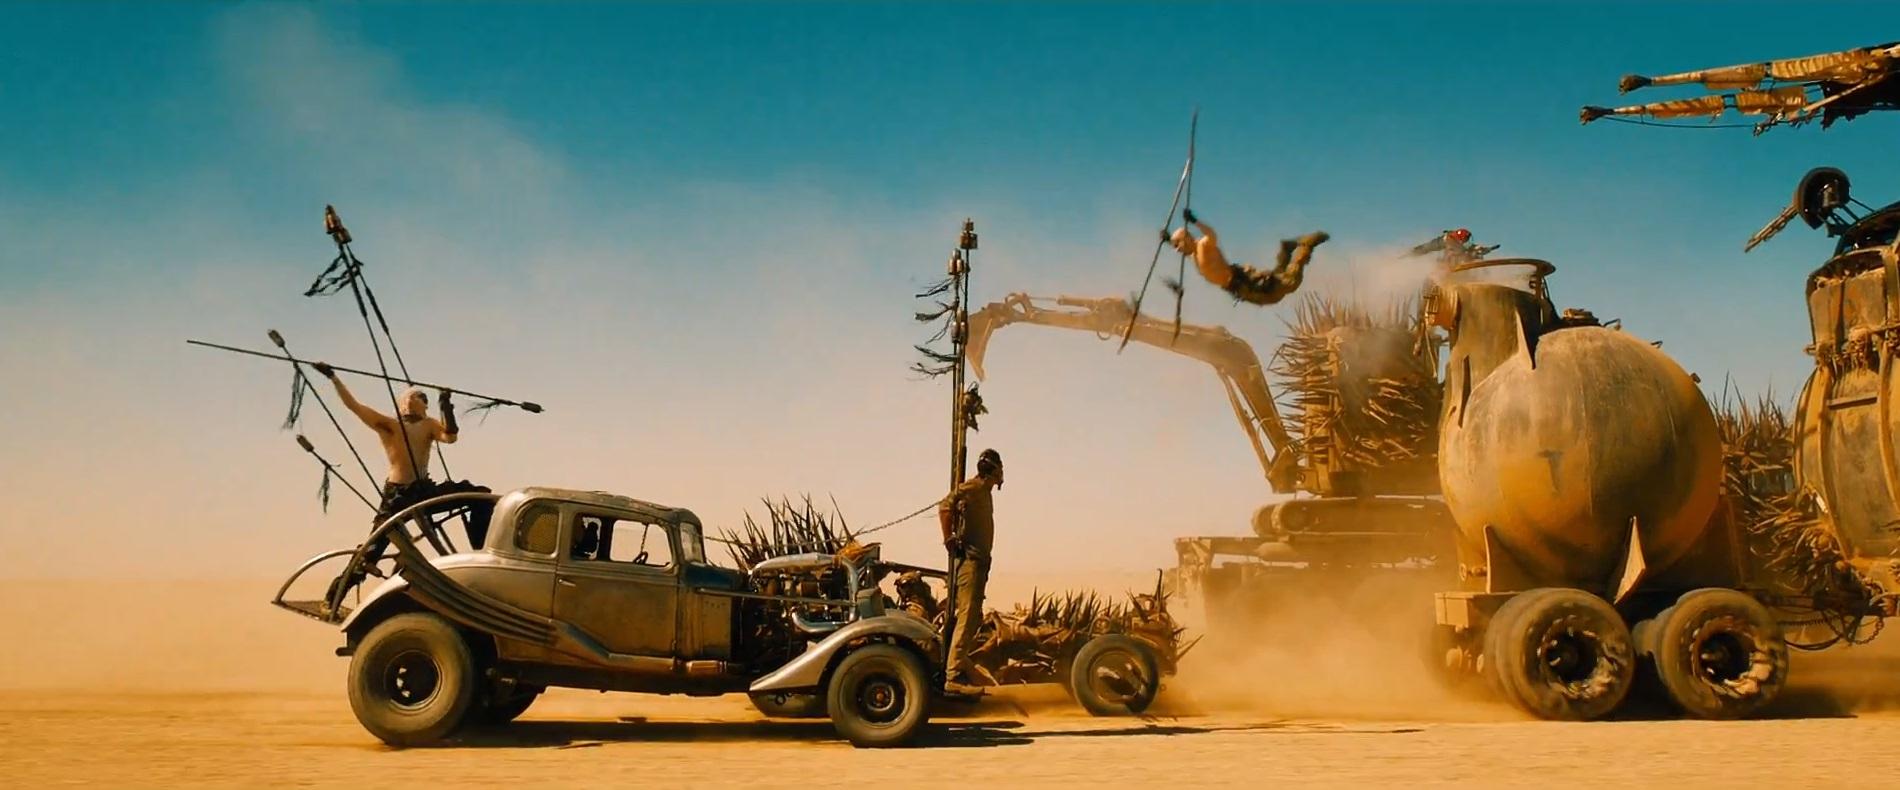 Mad-Max-Fury-Road 2